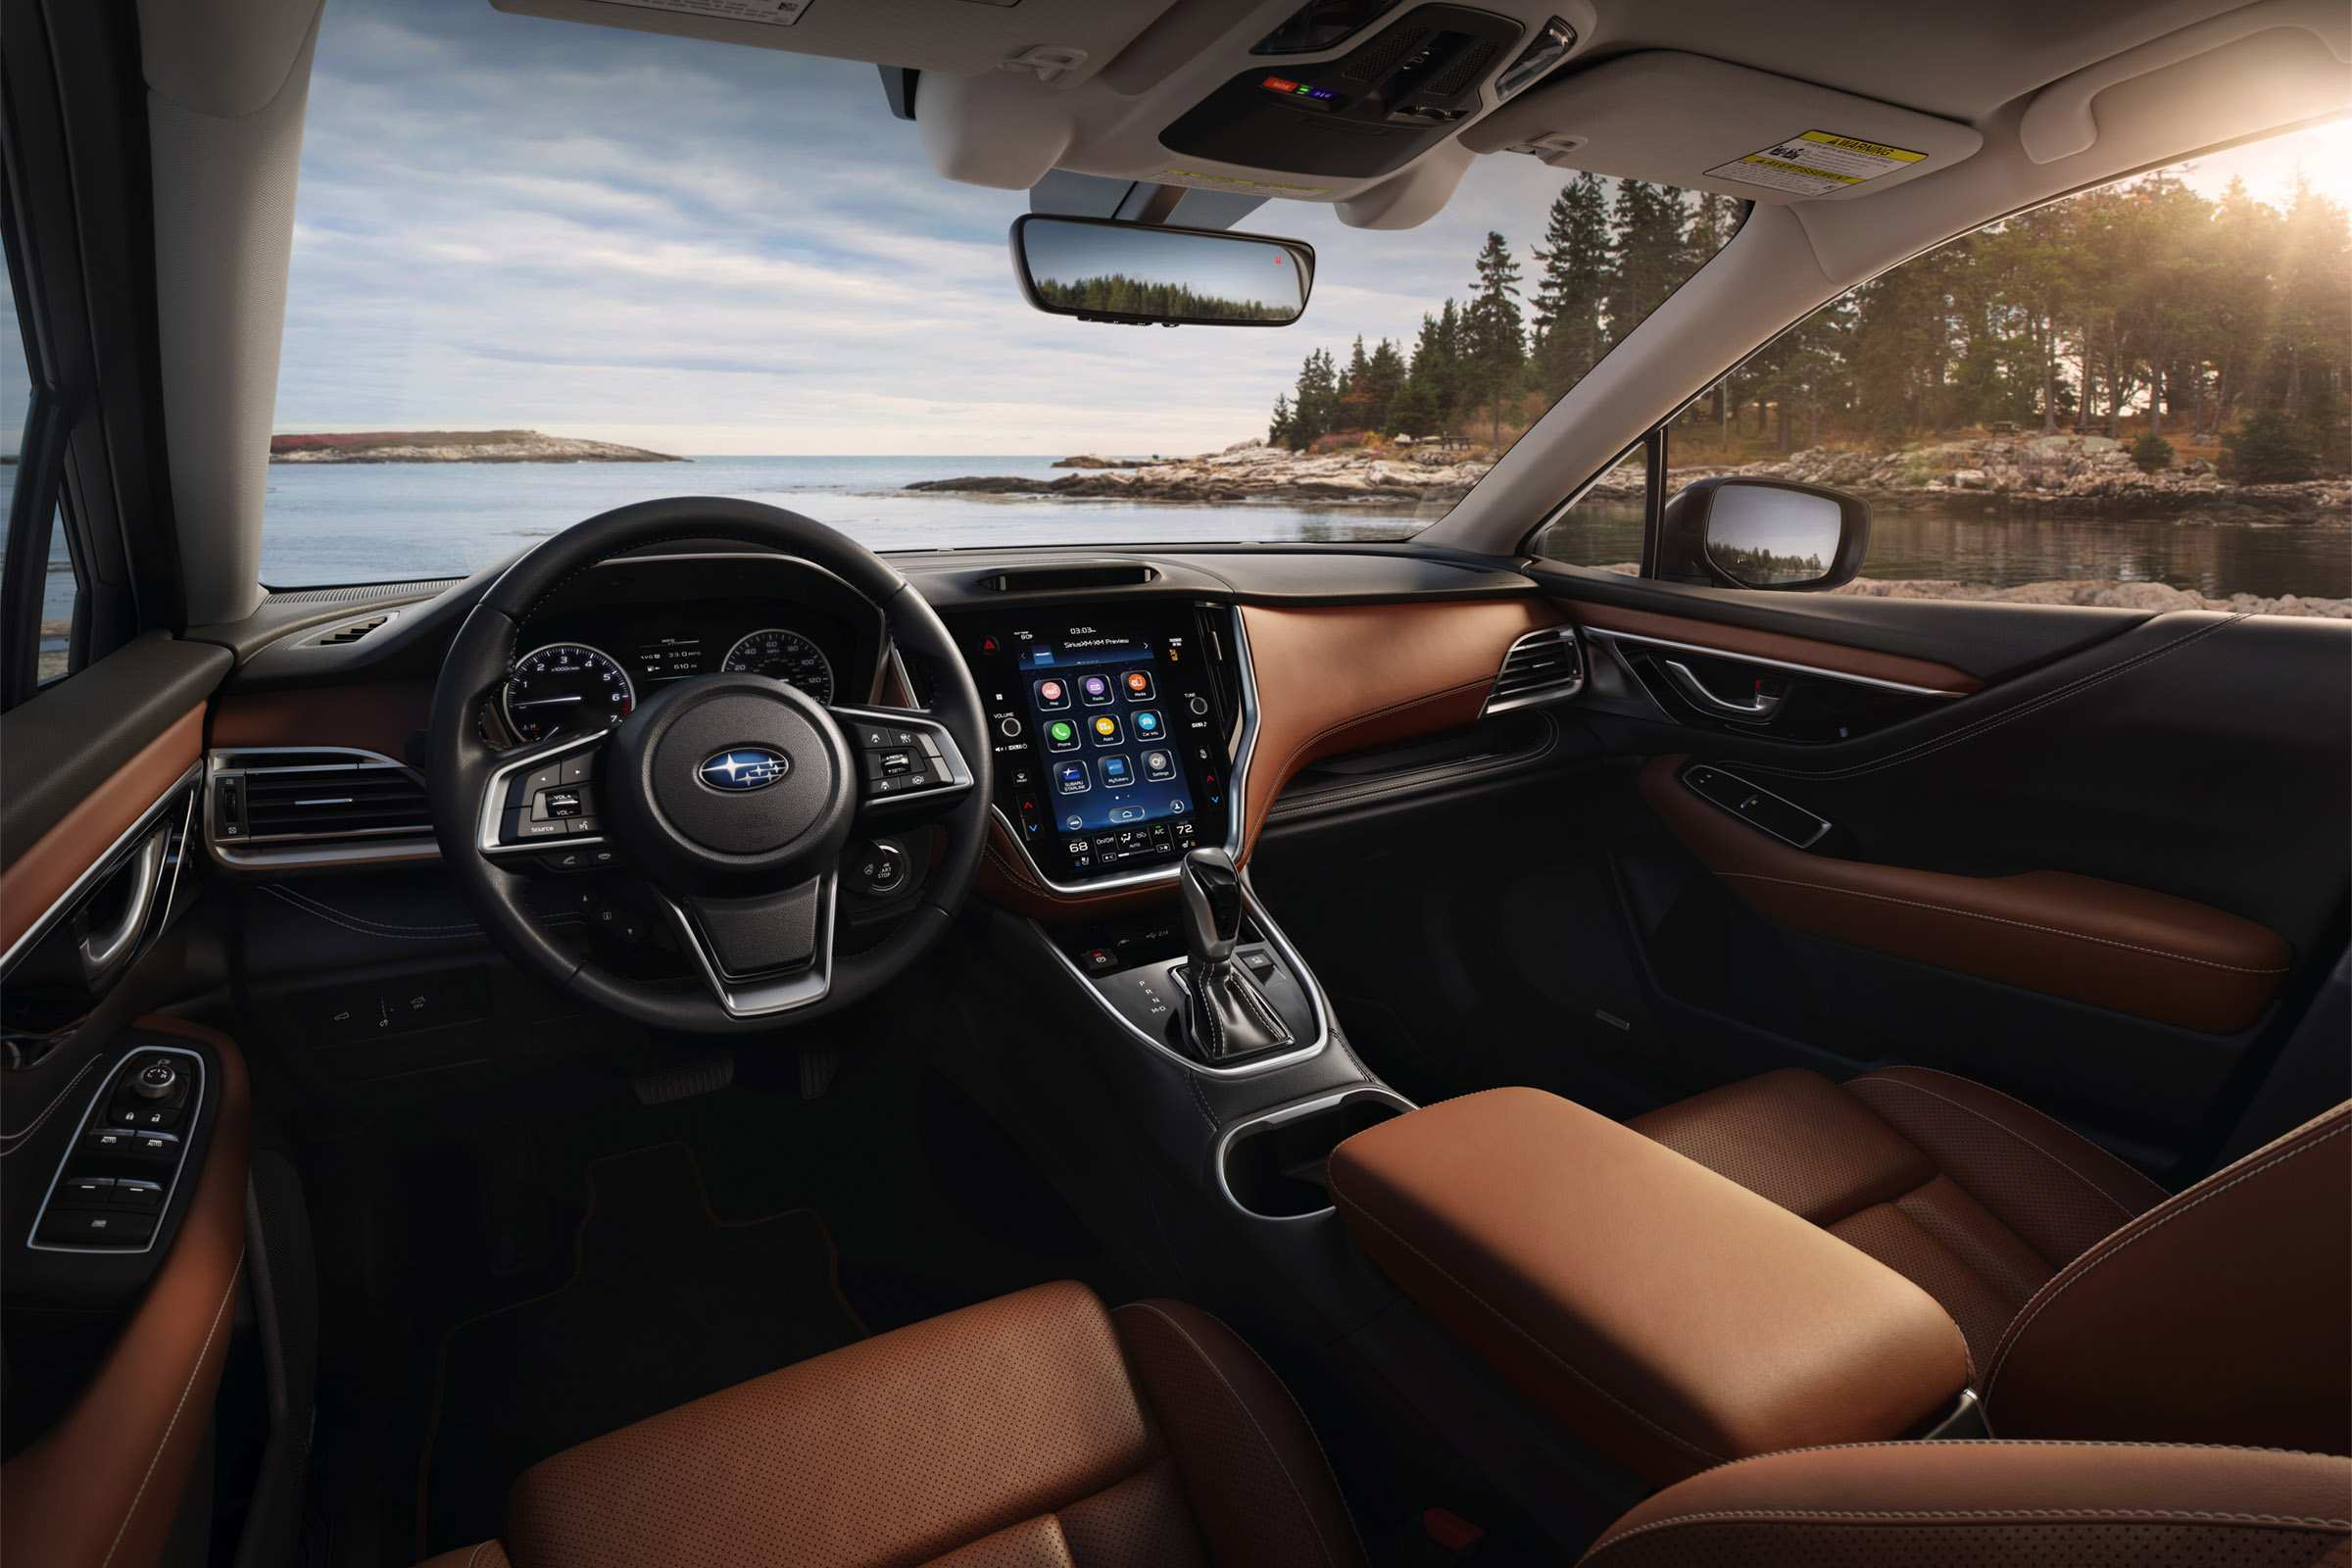 75 Gallery of 2020 Subaru Outback Gas Mileage Exterior and Interior for 2020 Subaru Outback Gas Mileage